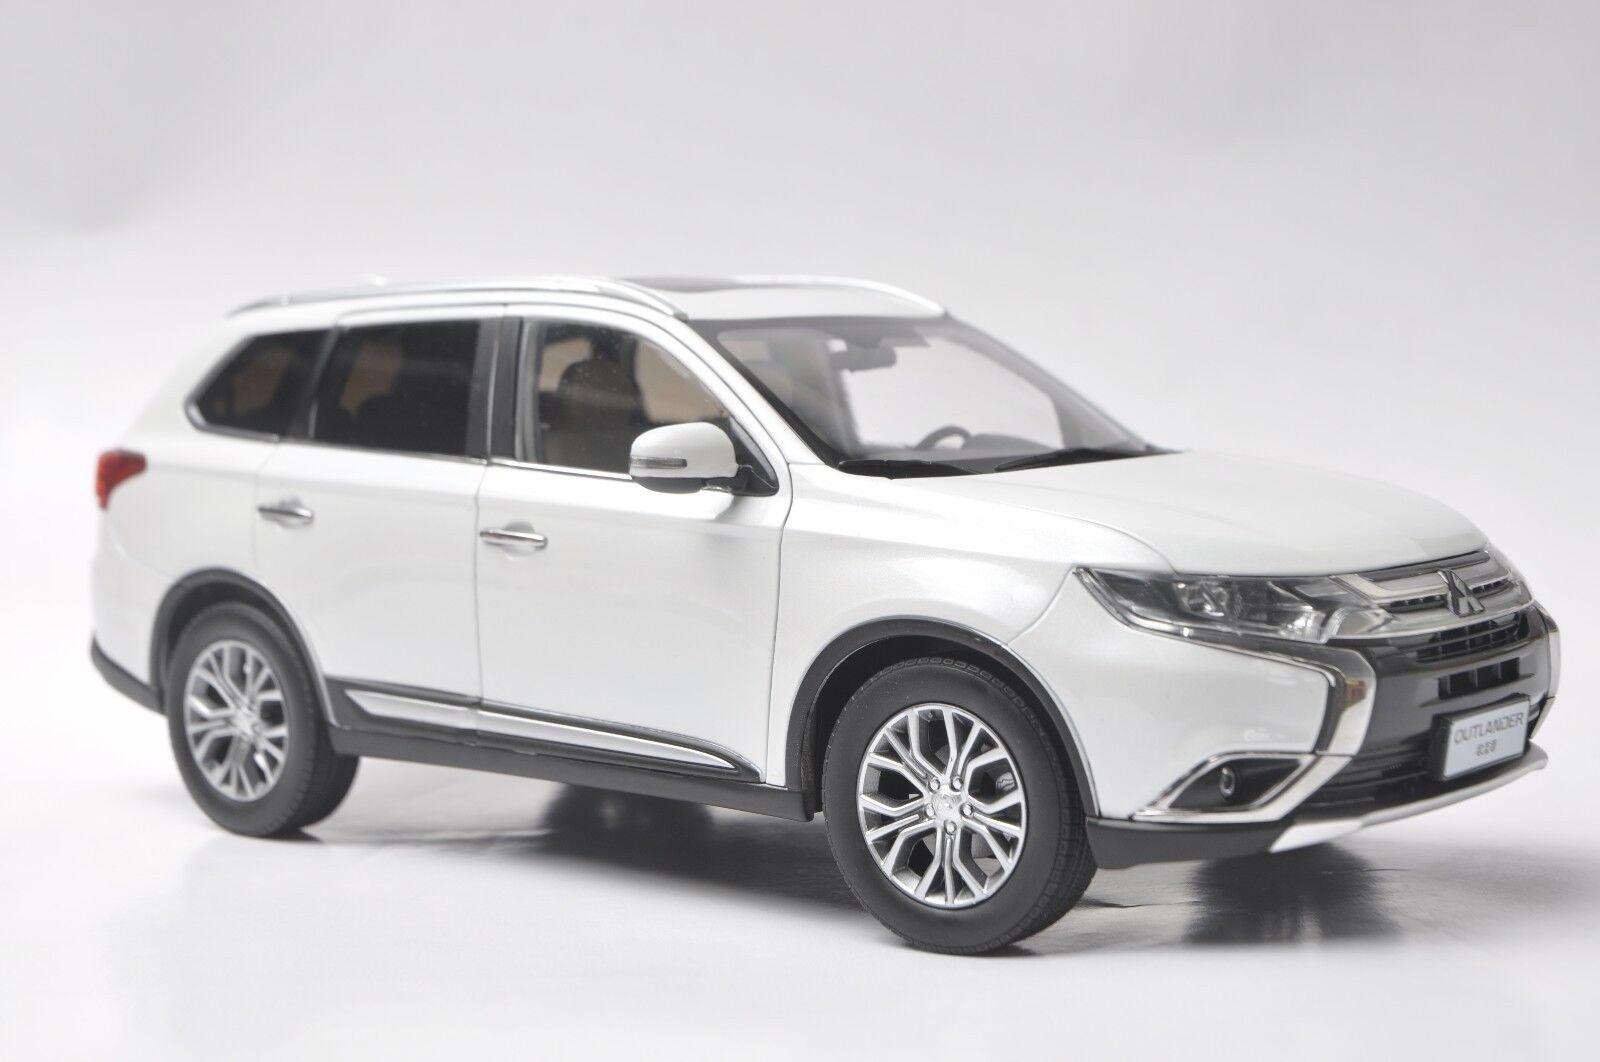 Mitsubishi Outlander 2017 car model in scale 1 18 bianca